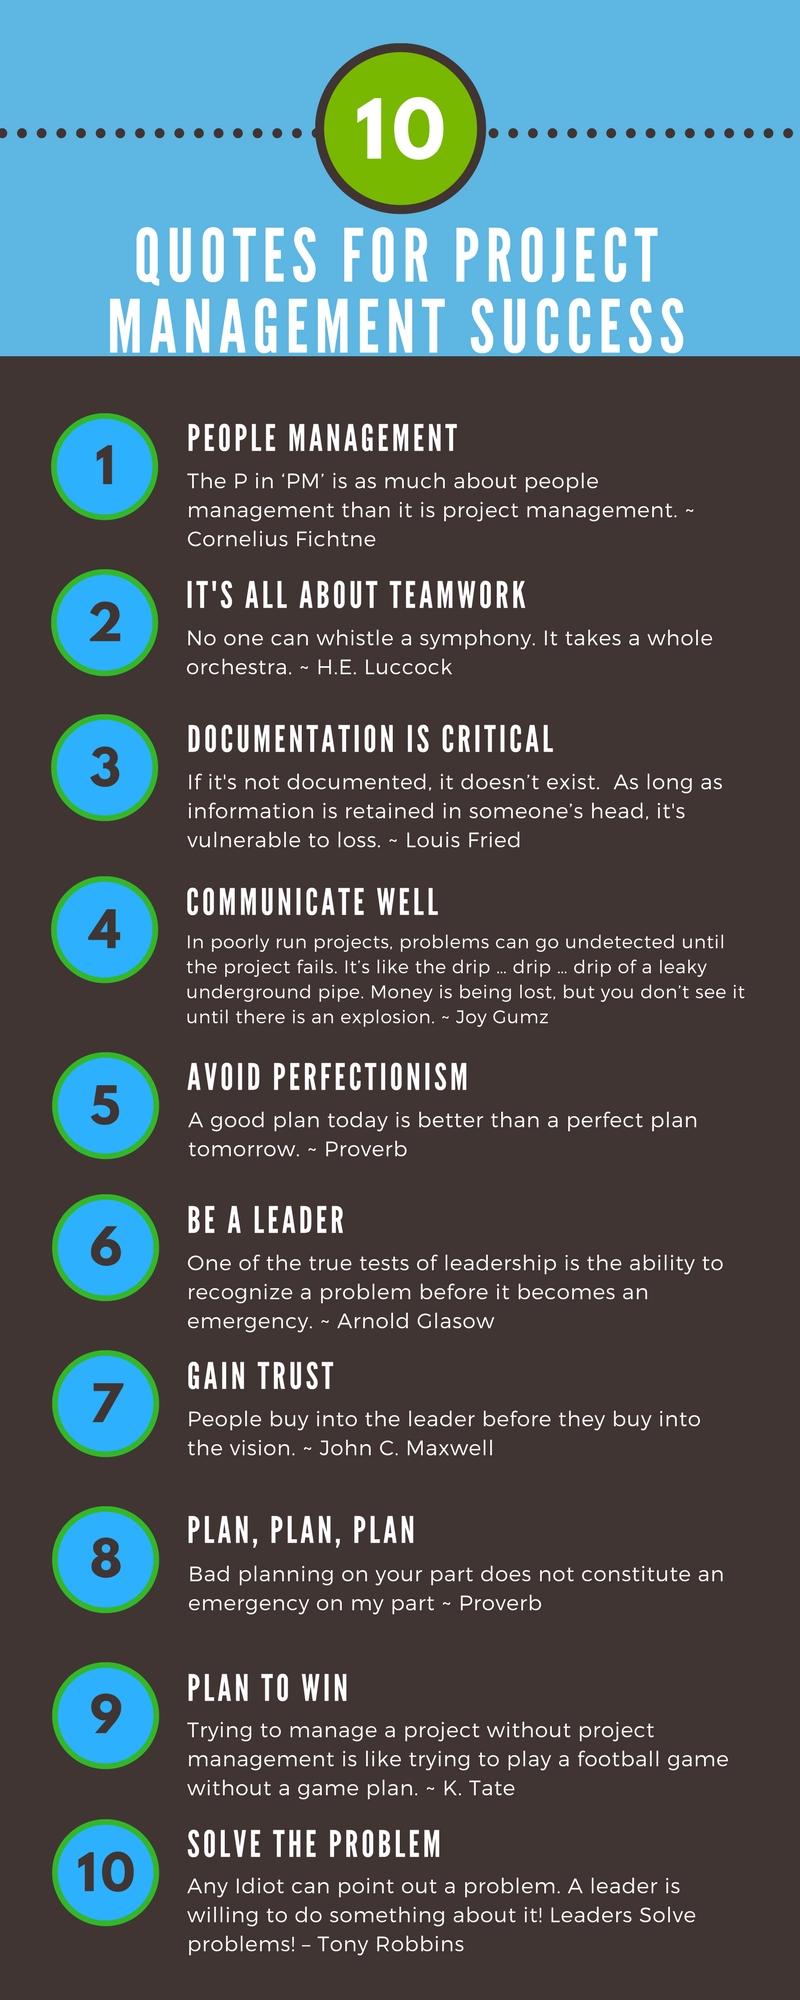 Project Management: 10 Best Quotes For Project Management Success (Infographic